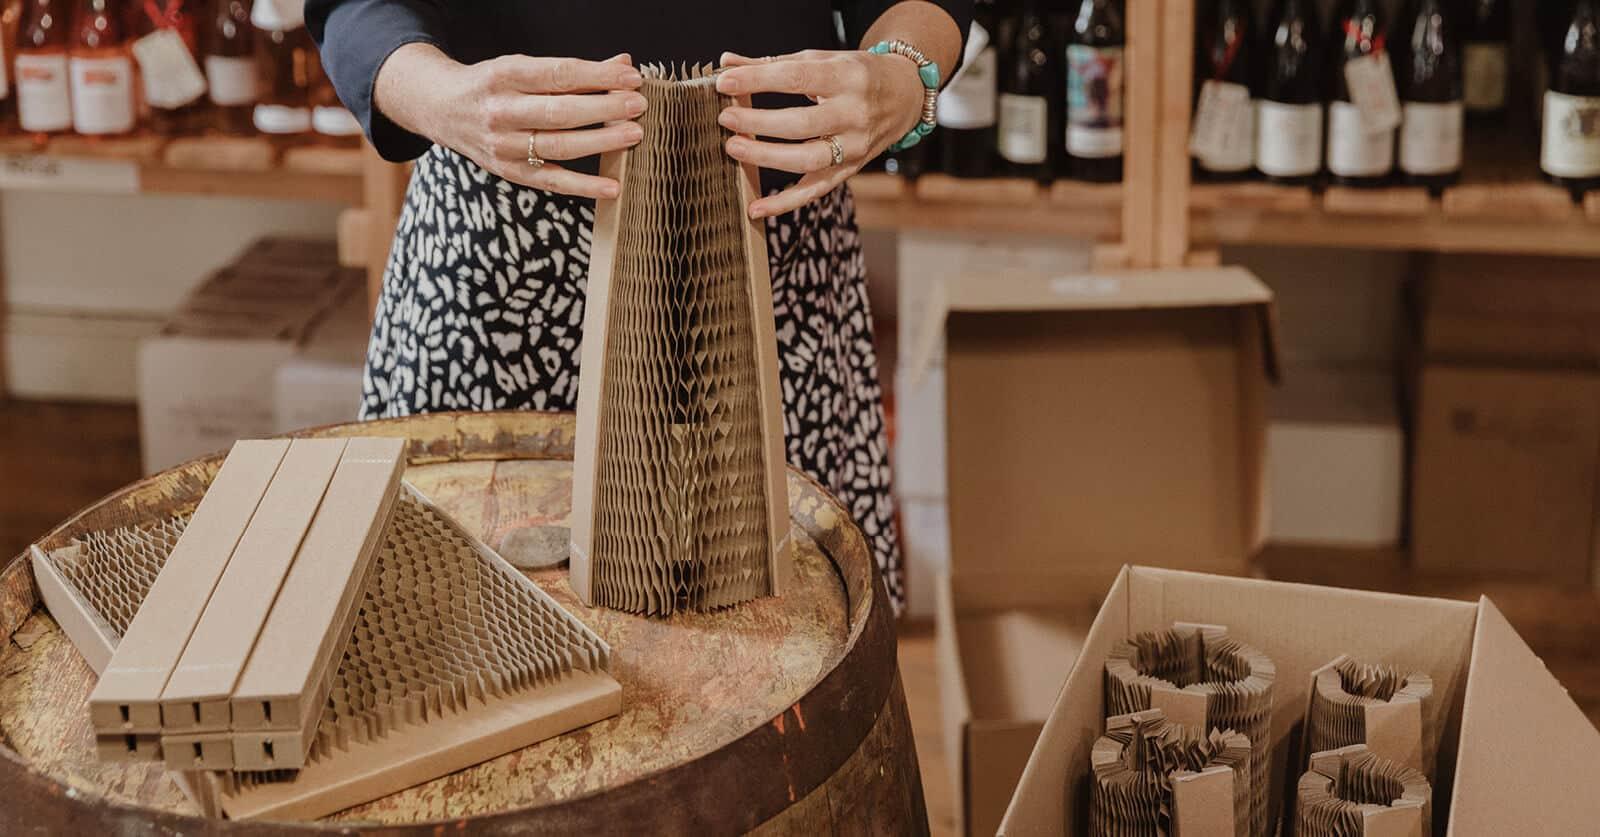 Flexi-Hex Sustainable EcoFriendly Wine Bottle Packaging English Wine Week